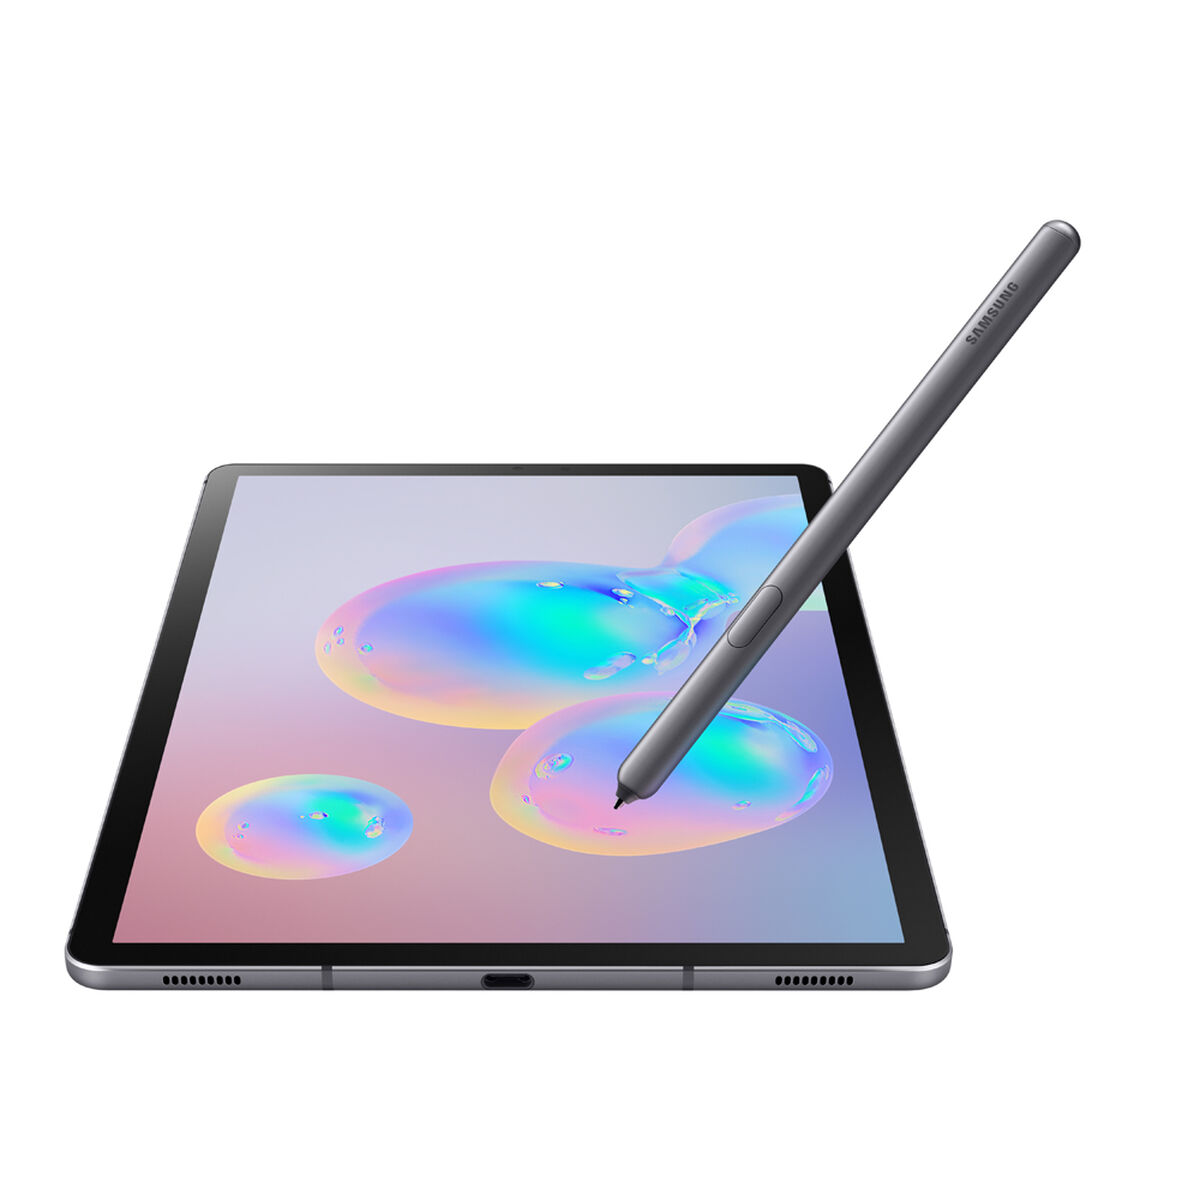 "Tablet Samsung SM-T860 S6 Octa Core 6GB 128GB 10.5"" Gris + Keyboard + S-Pen"